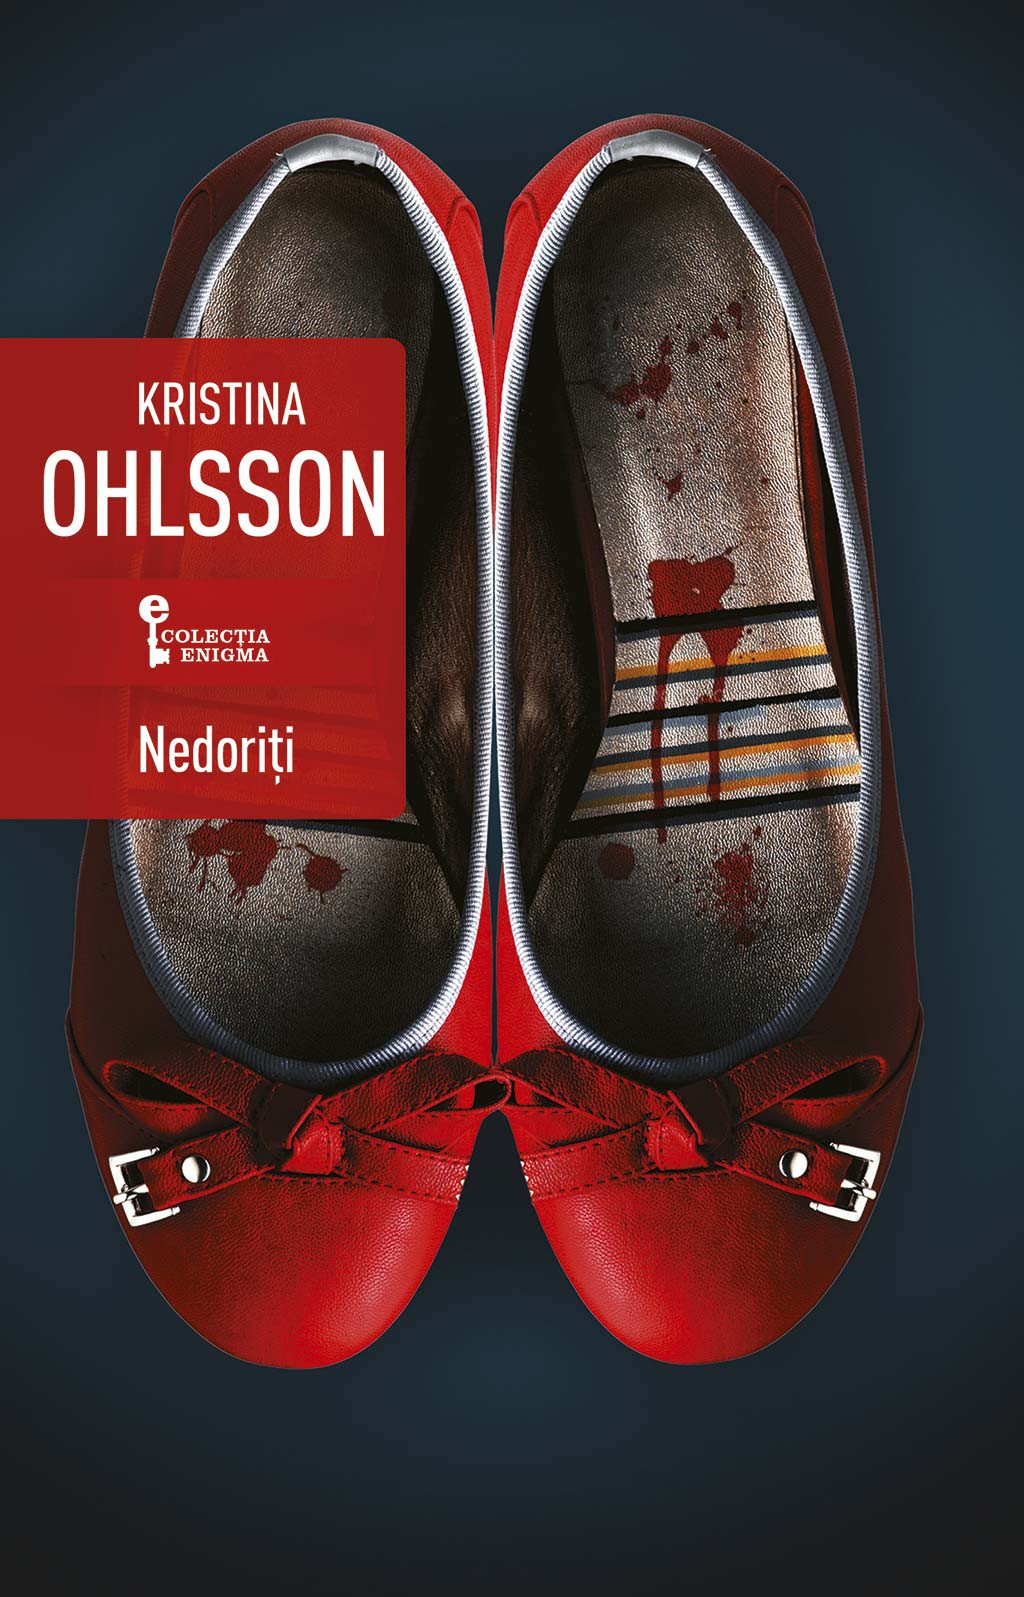 Kristina Ohlsson Ebook